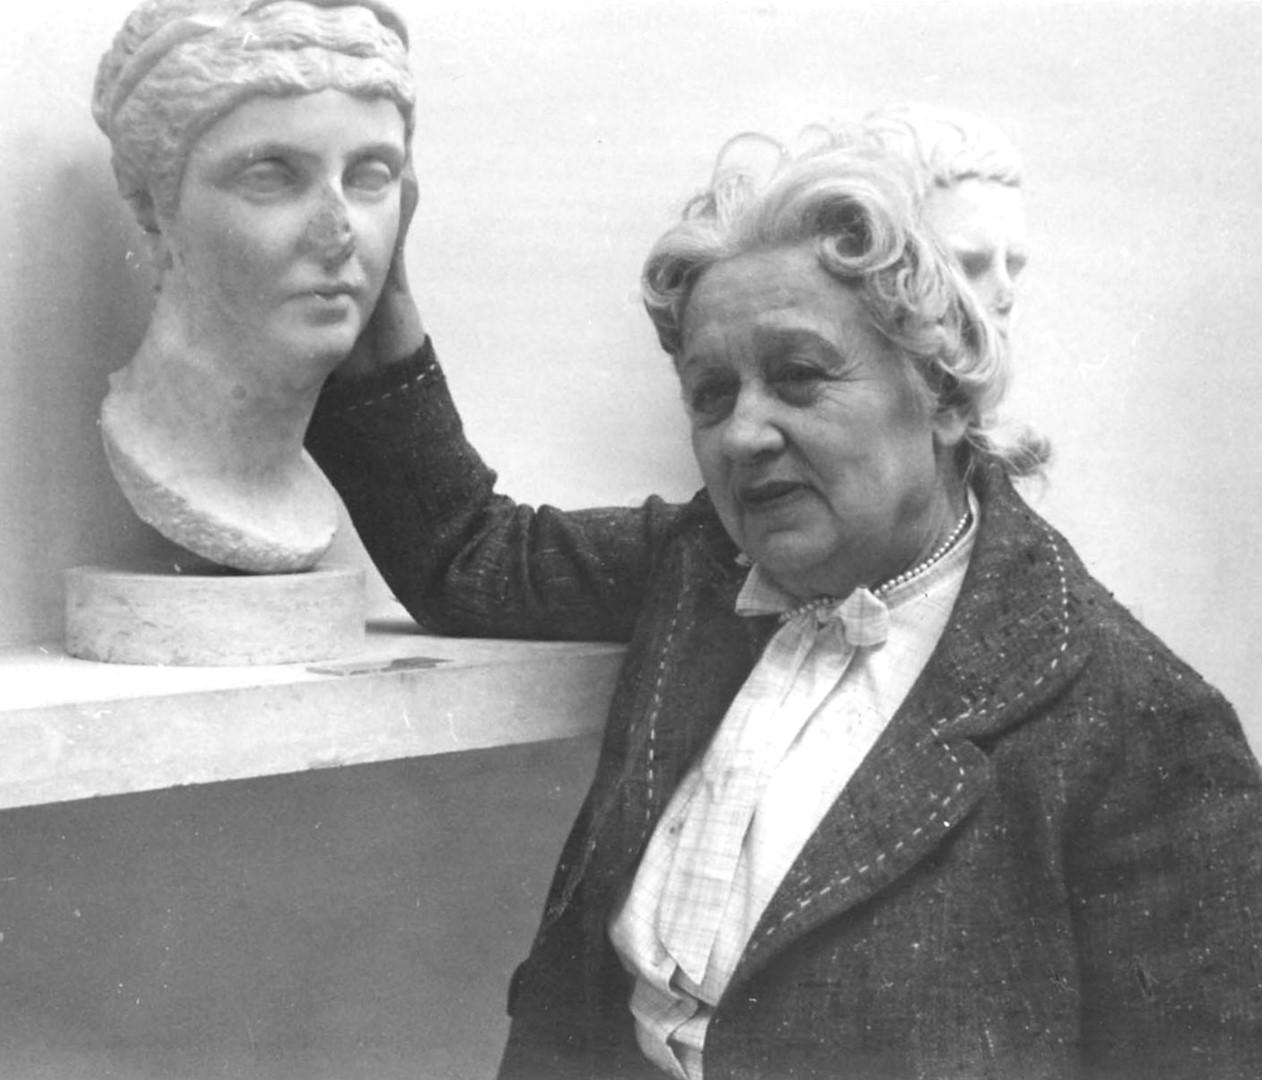 ostia-antica_museo-ostiense_raissa-gourevich-calza_1964_foto-ostia-antica